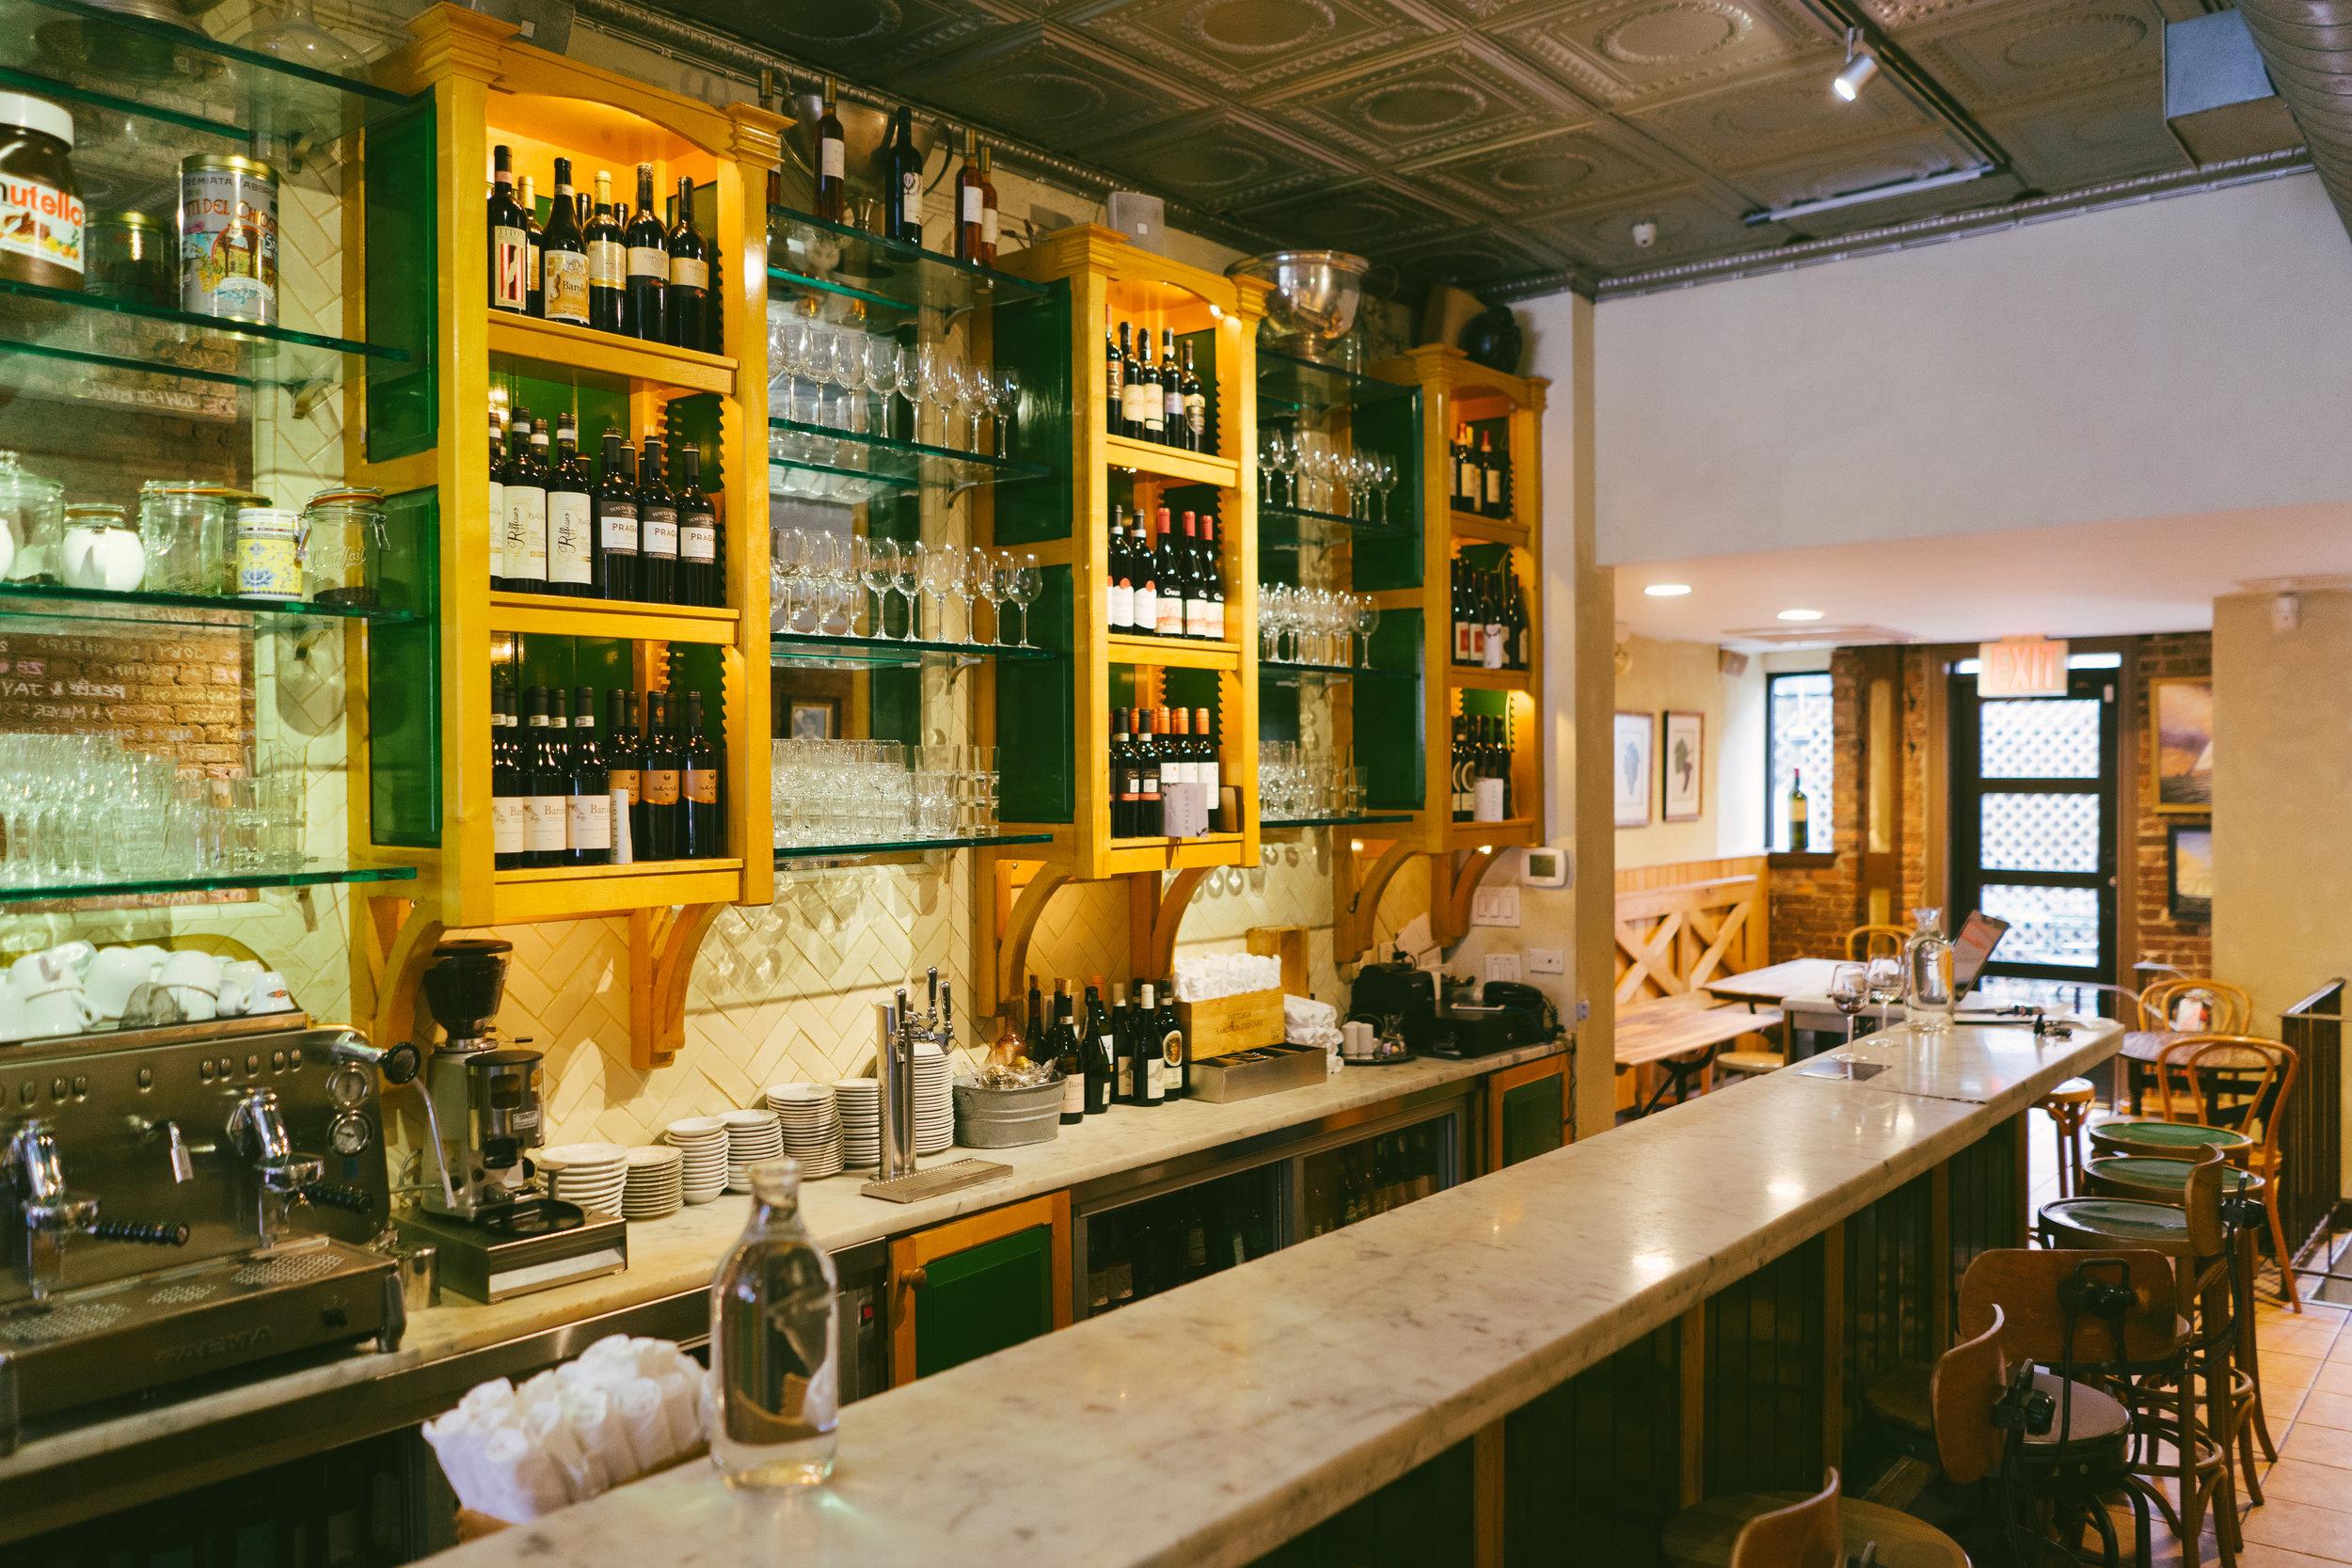 NoahDevereaux_WineBars_Gottino_09_Interior.JPG